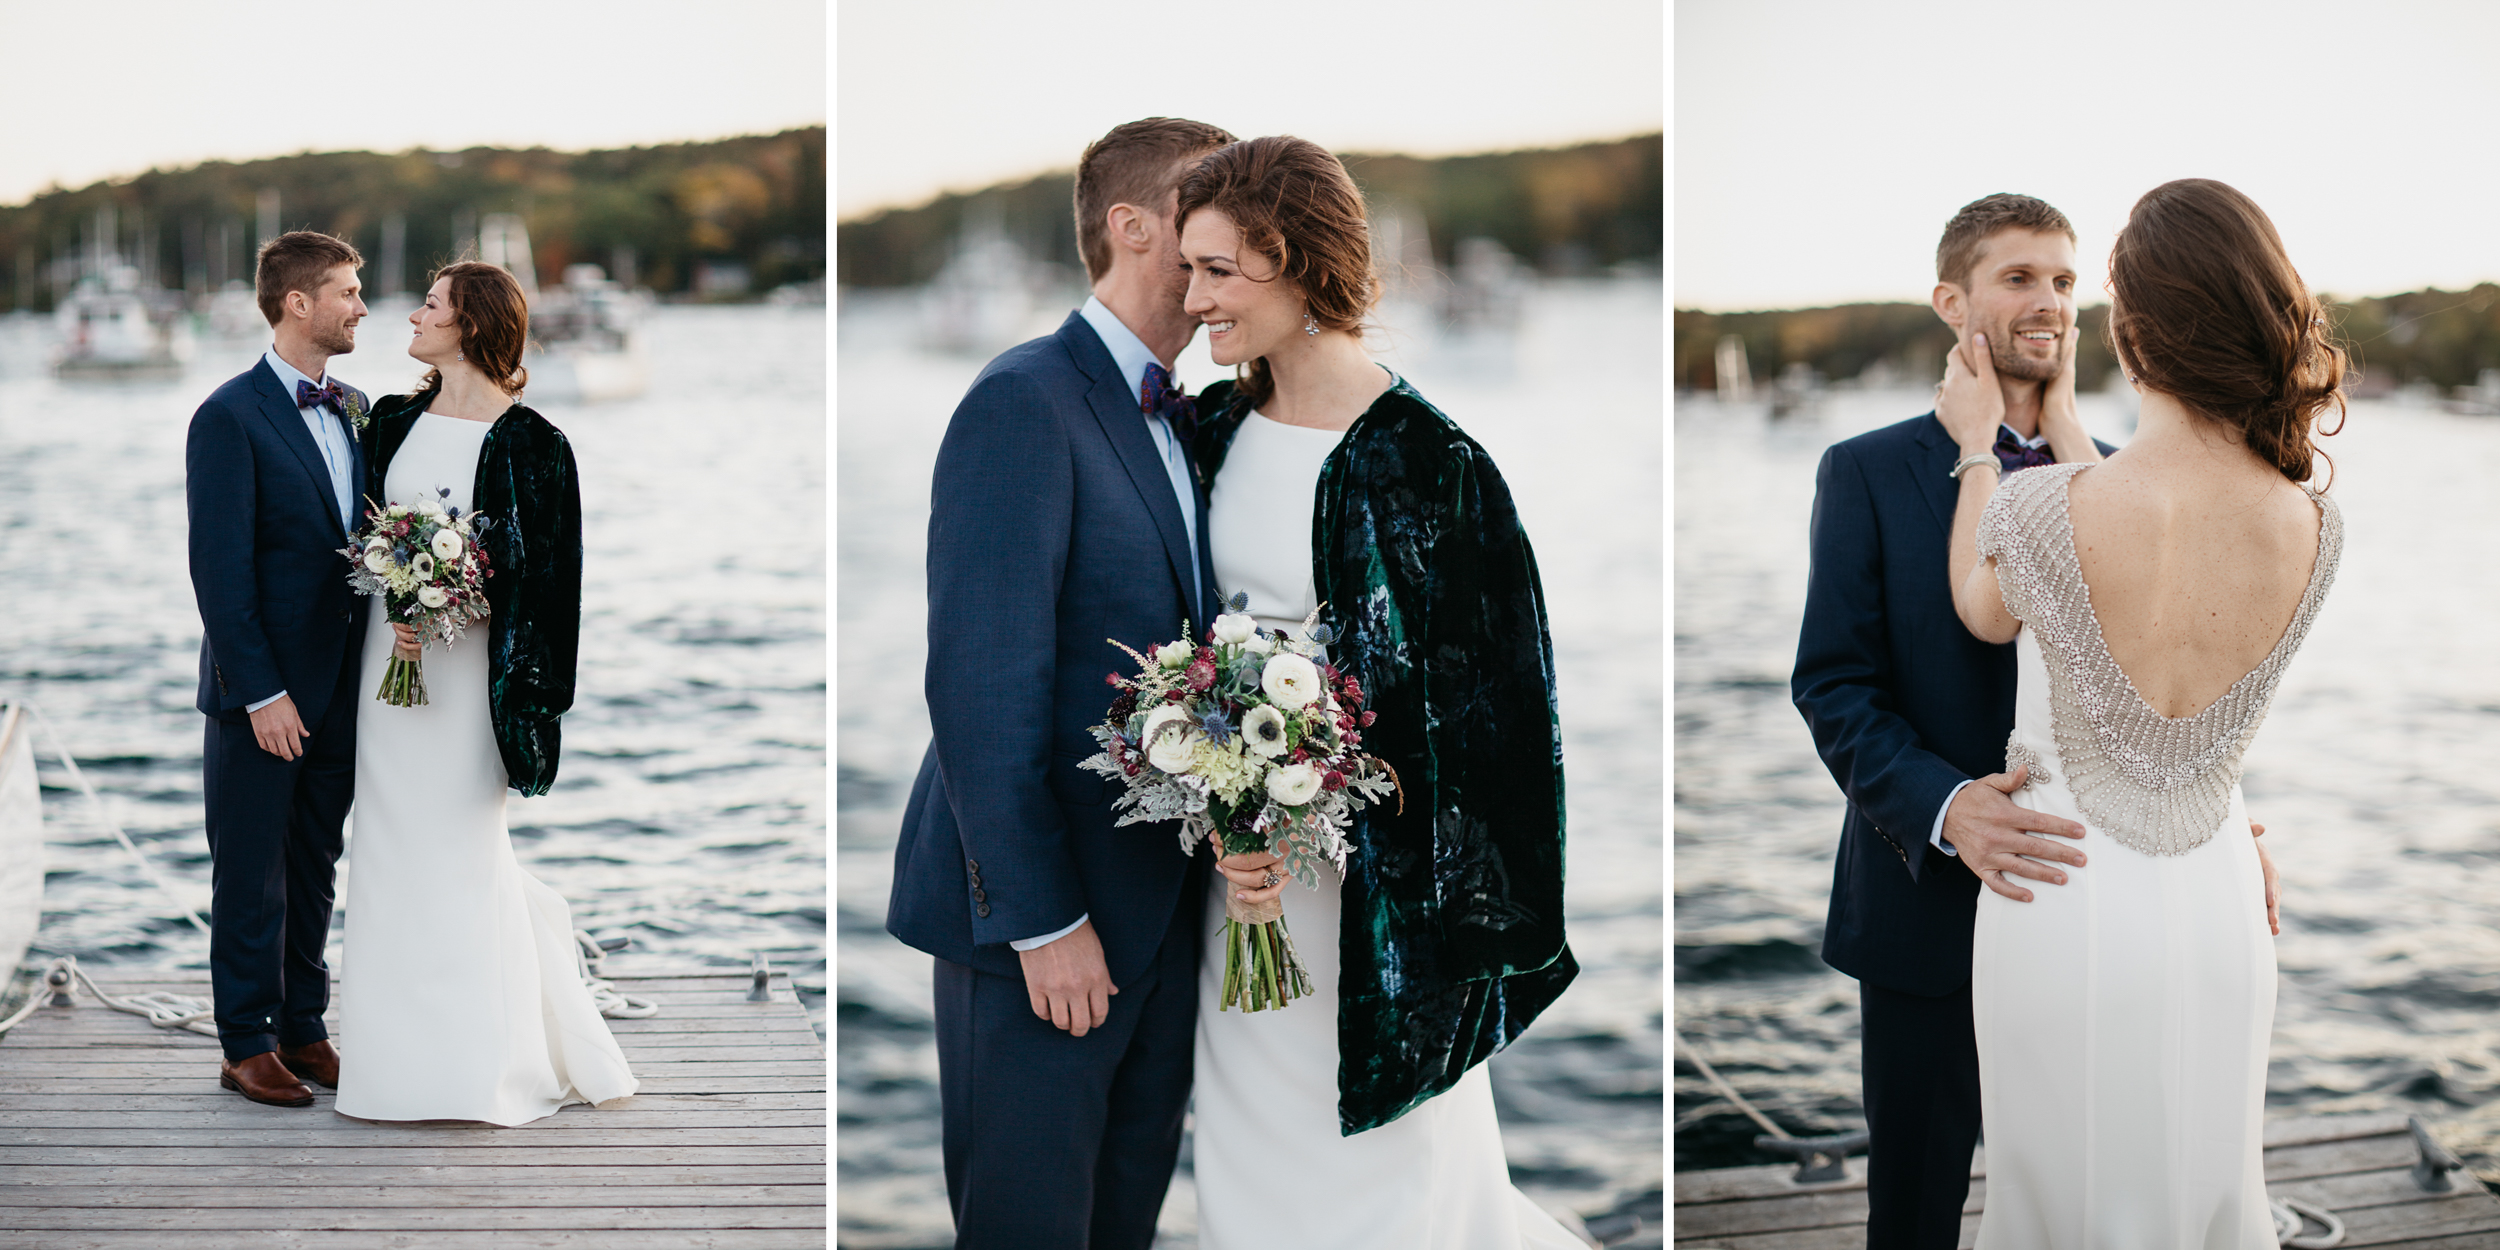 Mackenzie_Collins_Maine_wedding_in_Rockport_Union_hall_Nina_June_032.jpg